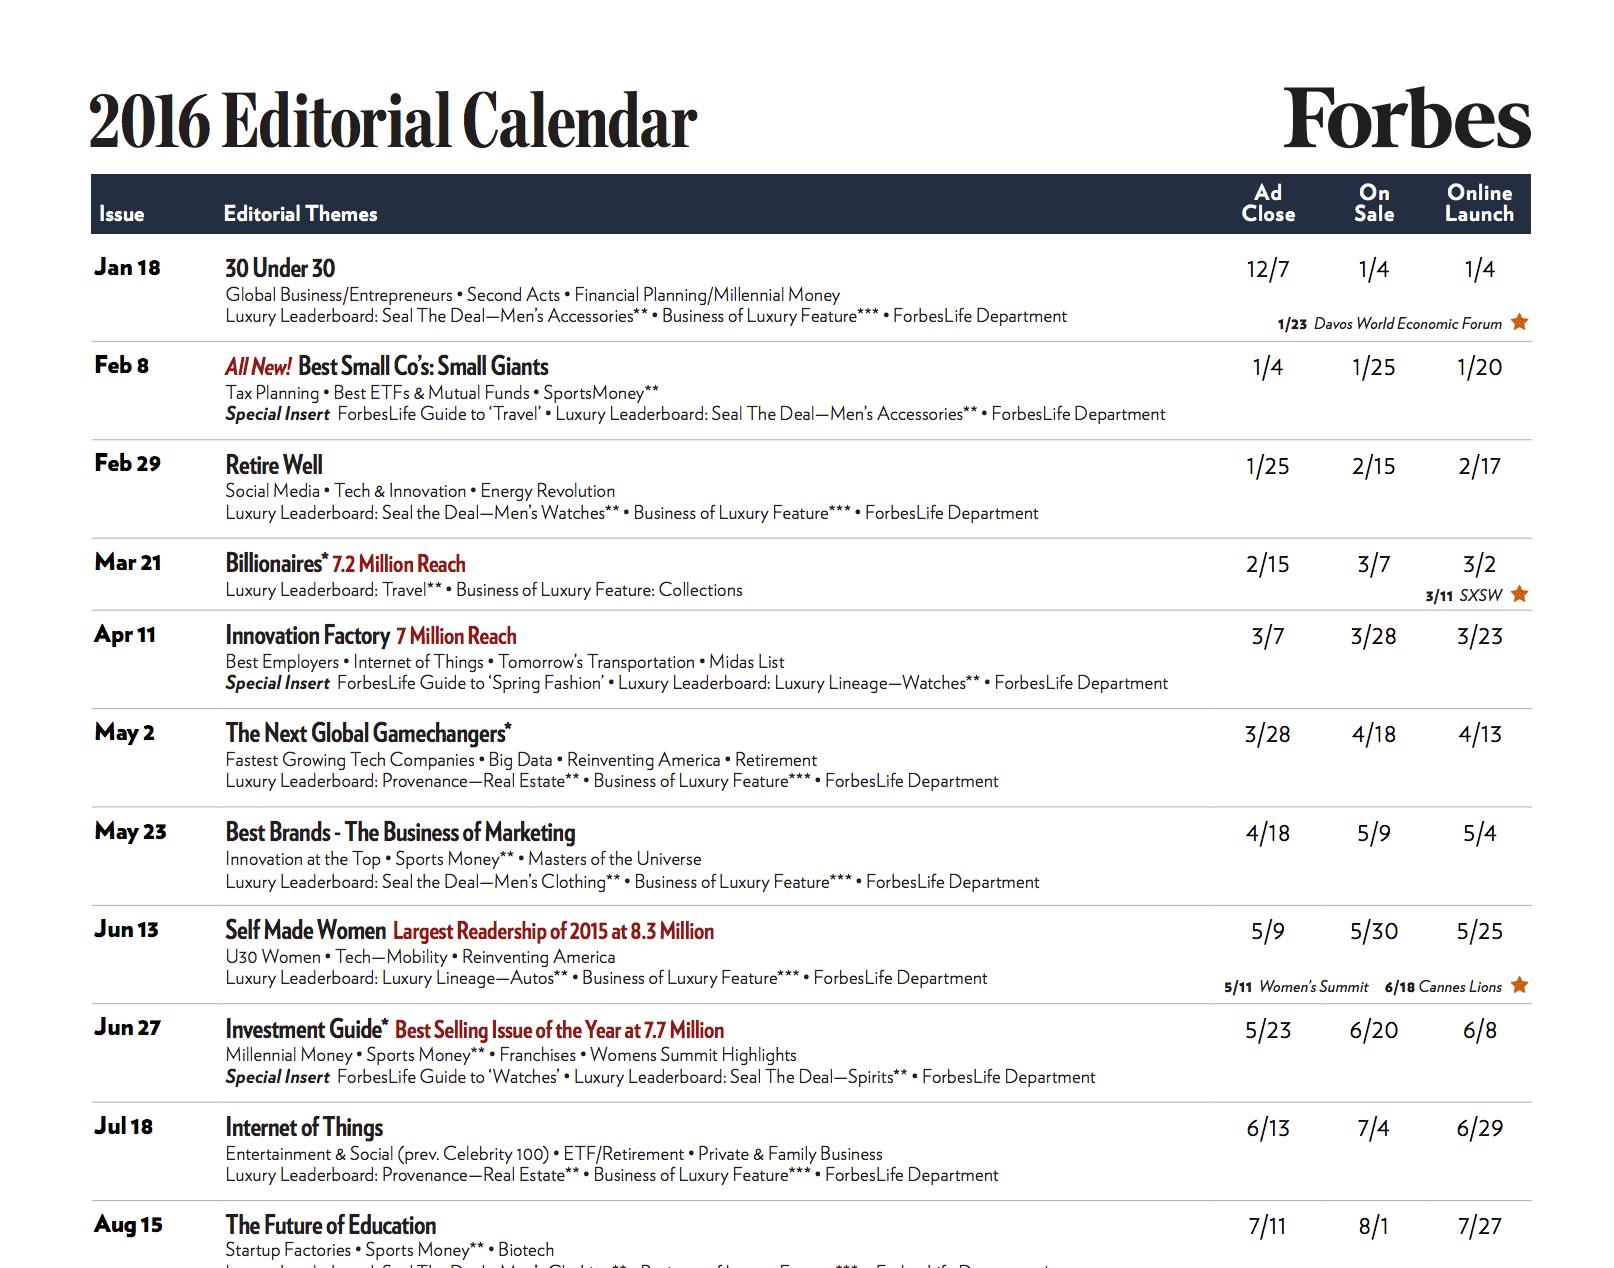 Forbes Editorial Calendar